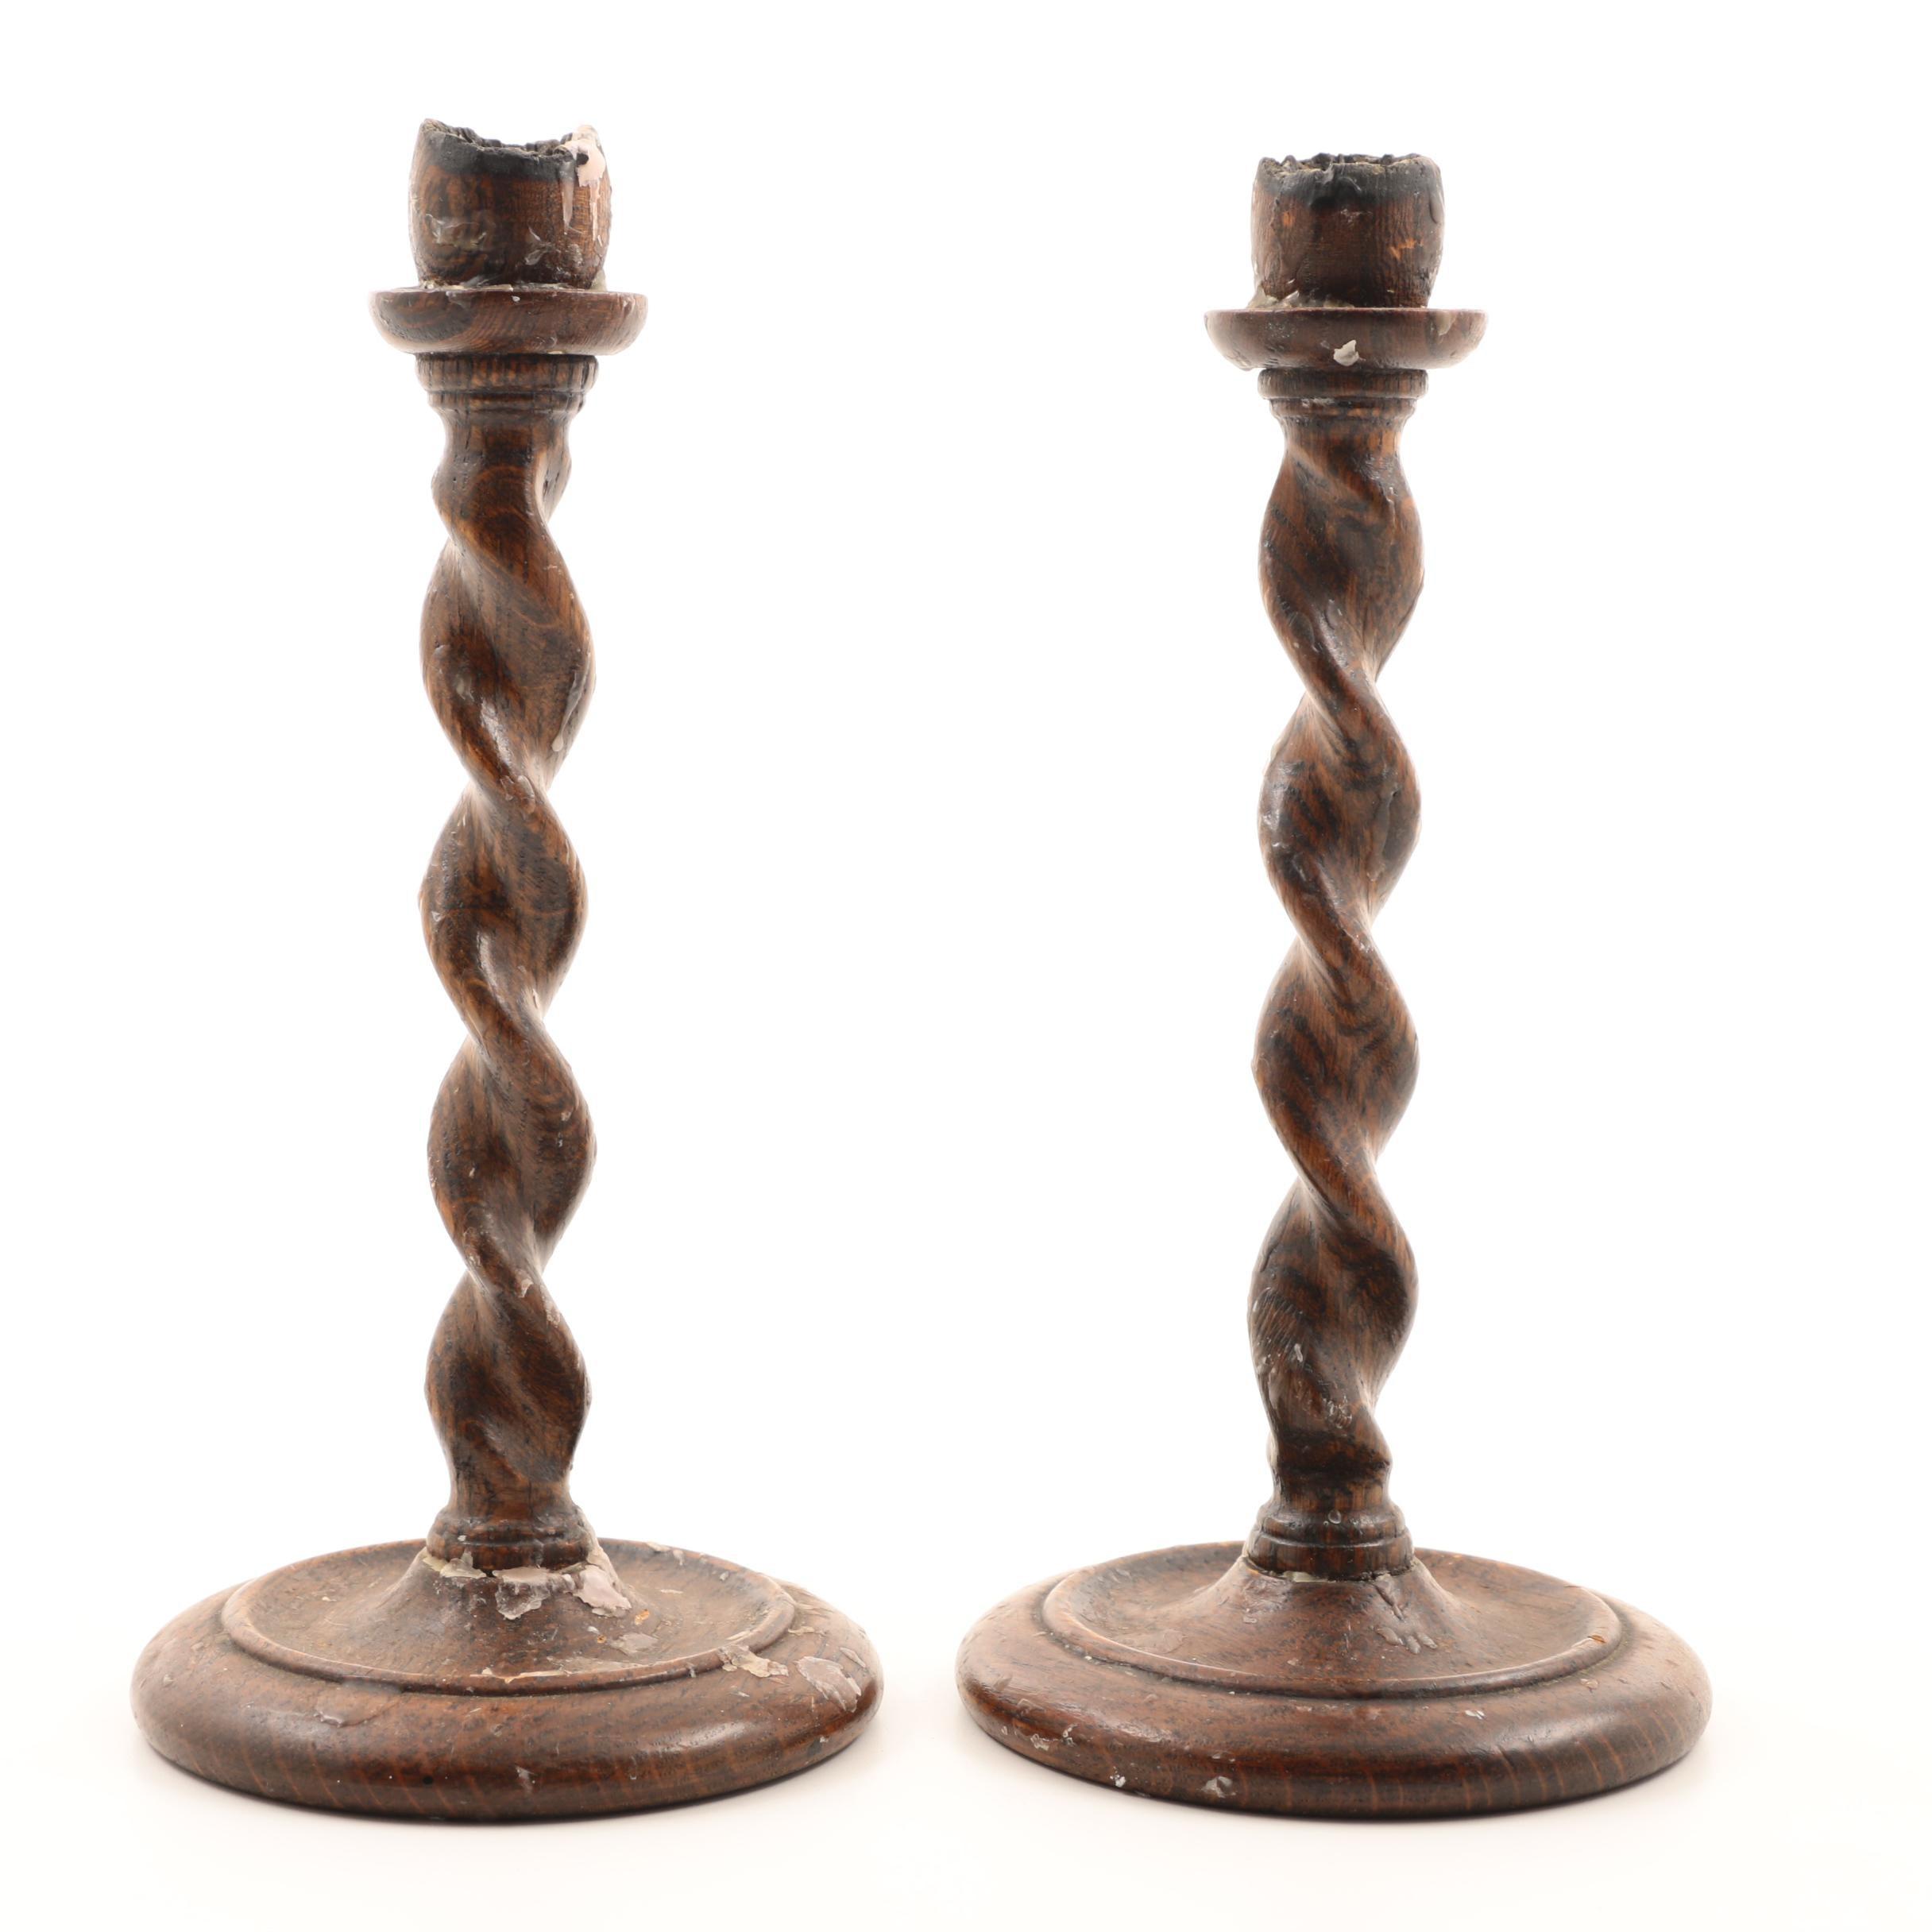 Pair of Barley Twist Oak Candlesticks